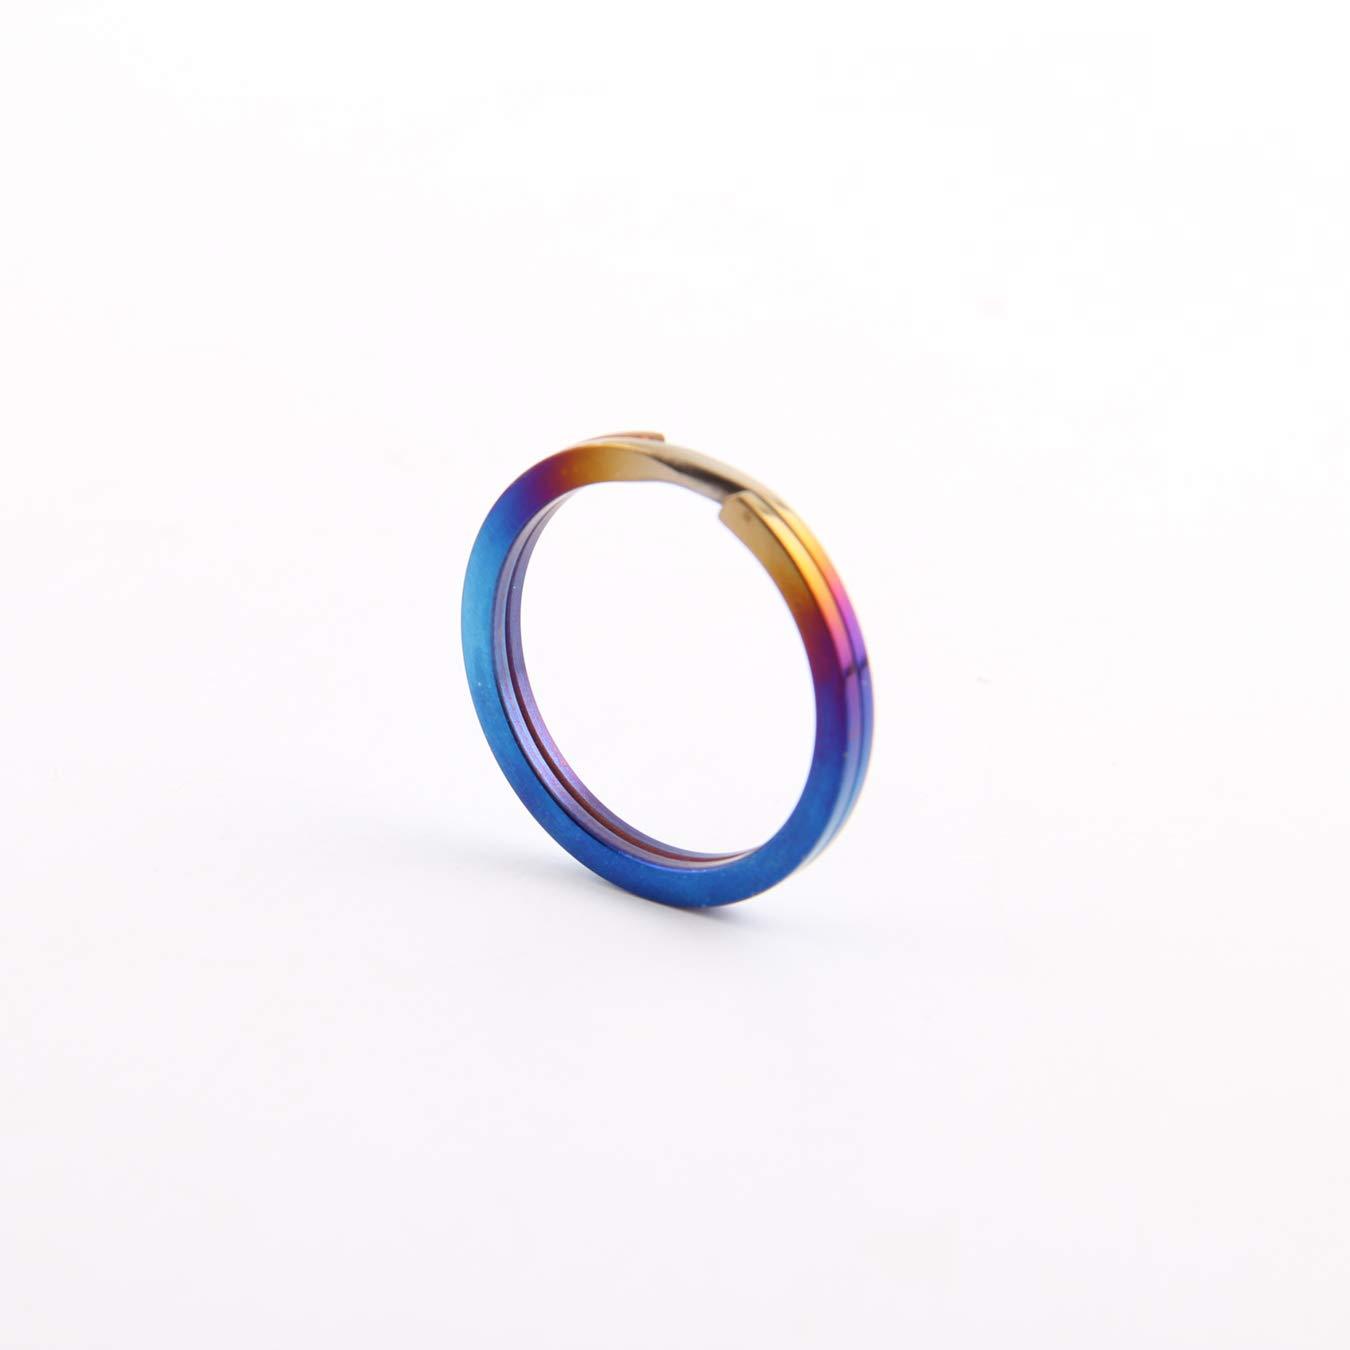 Tiremet Titanium Stinger Self Defense Keychain Keyring Kubotan Kubaton Pocket Stick (O-Ring(Blue)) by Tiremet